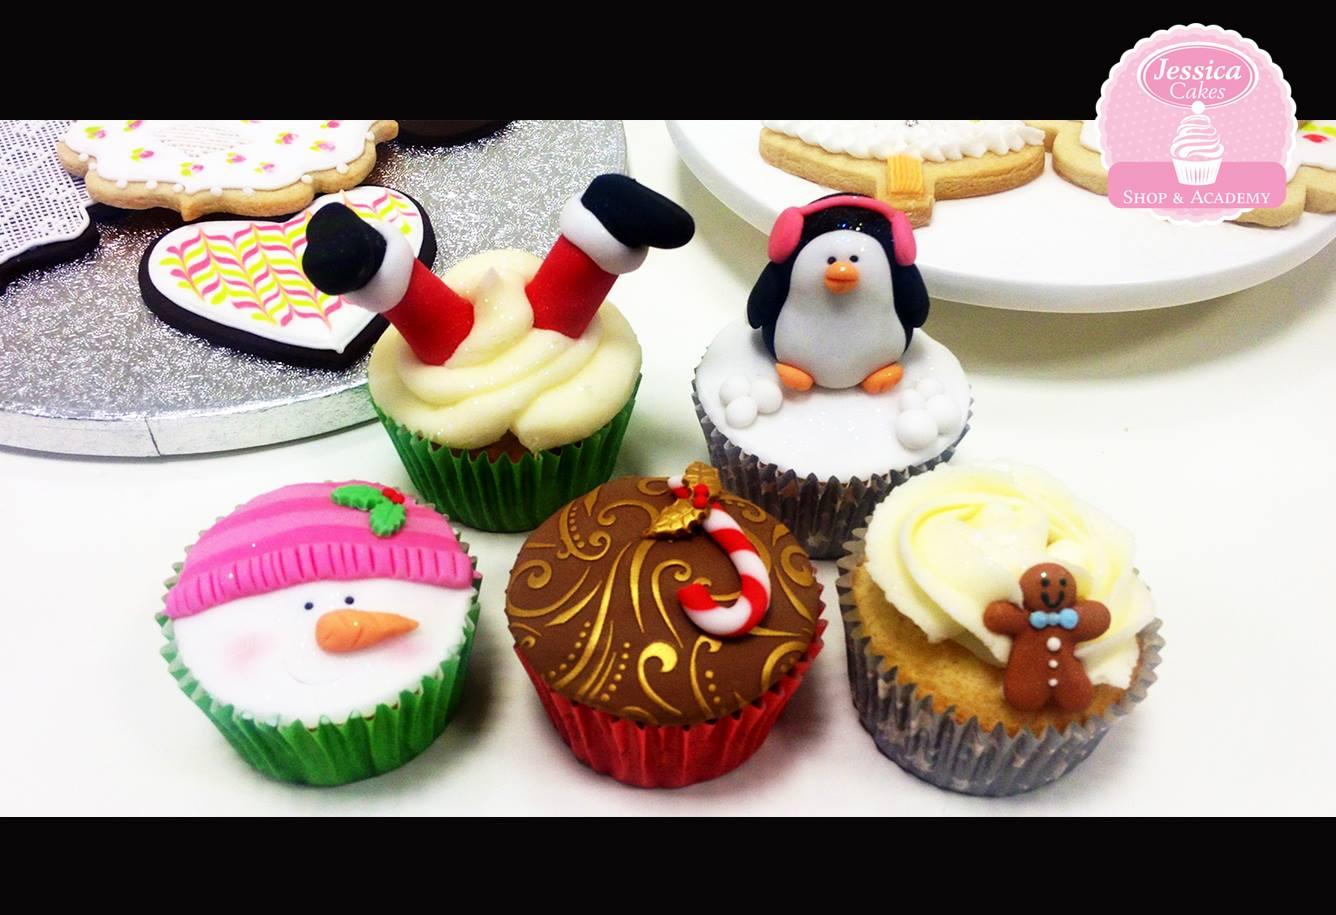 ¡Disfruta de los cupcakes en Bucaramanga!